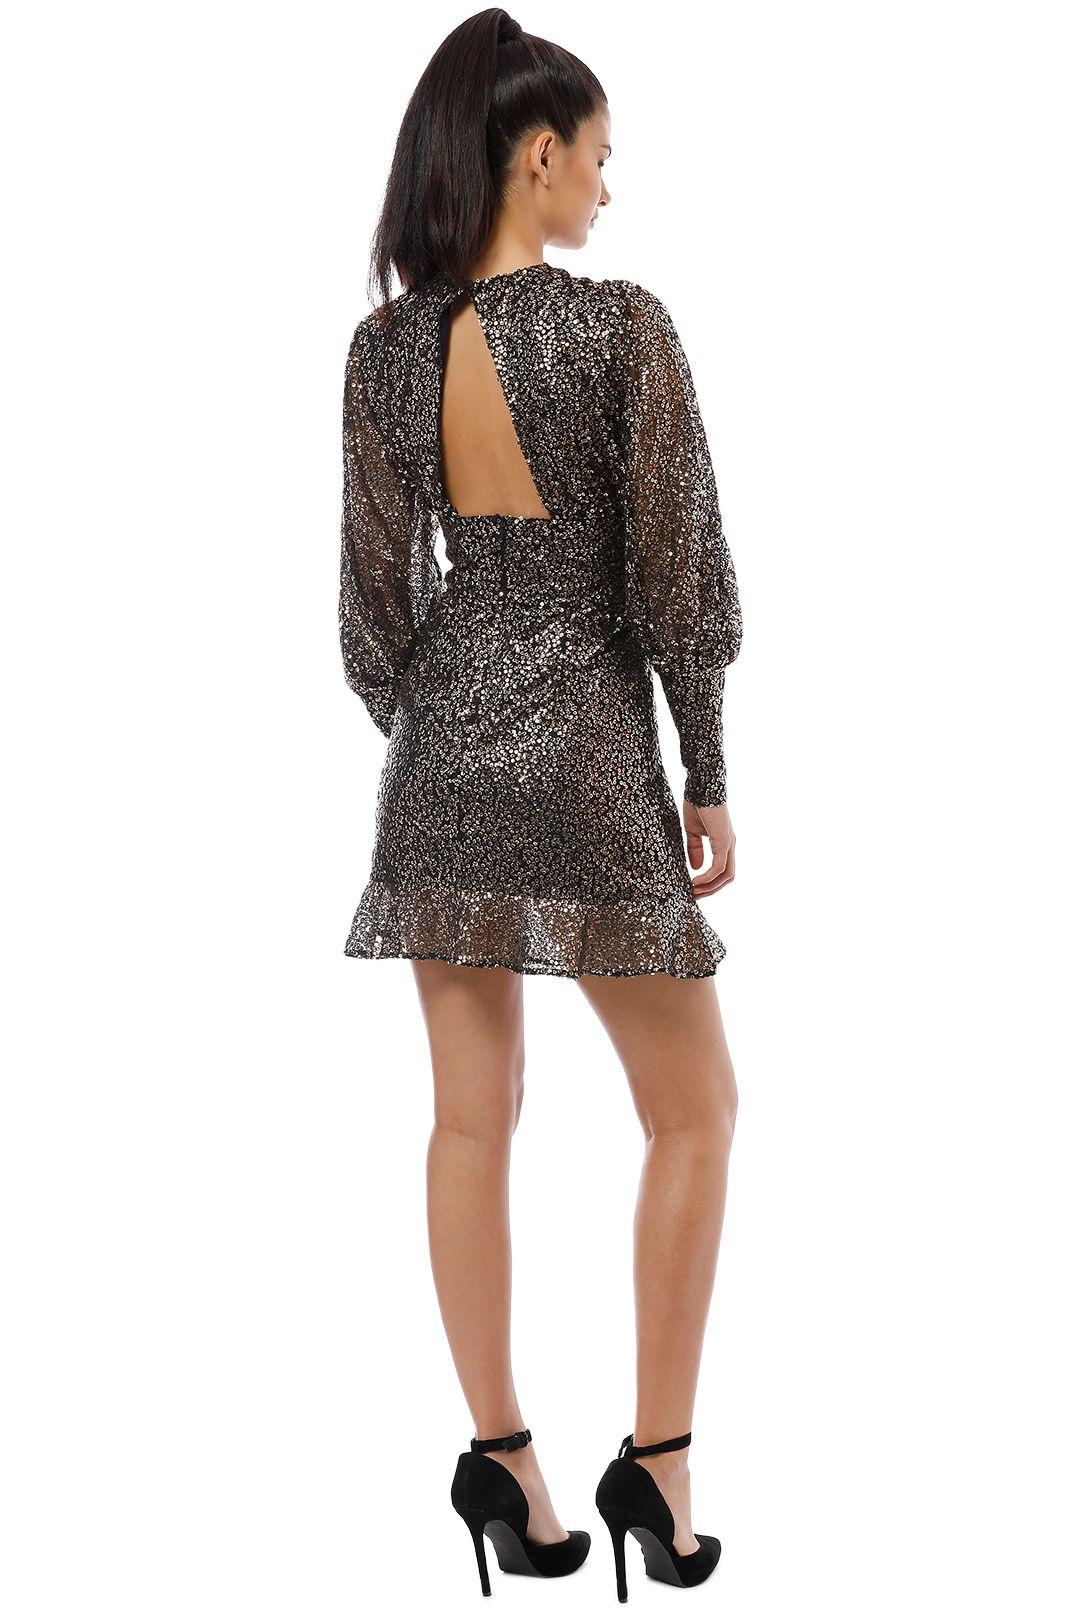 Misha Collection - Brielle Mini Dress - Black Gold - Back